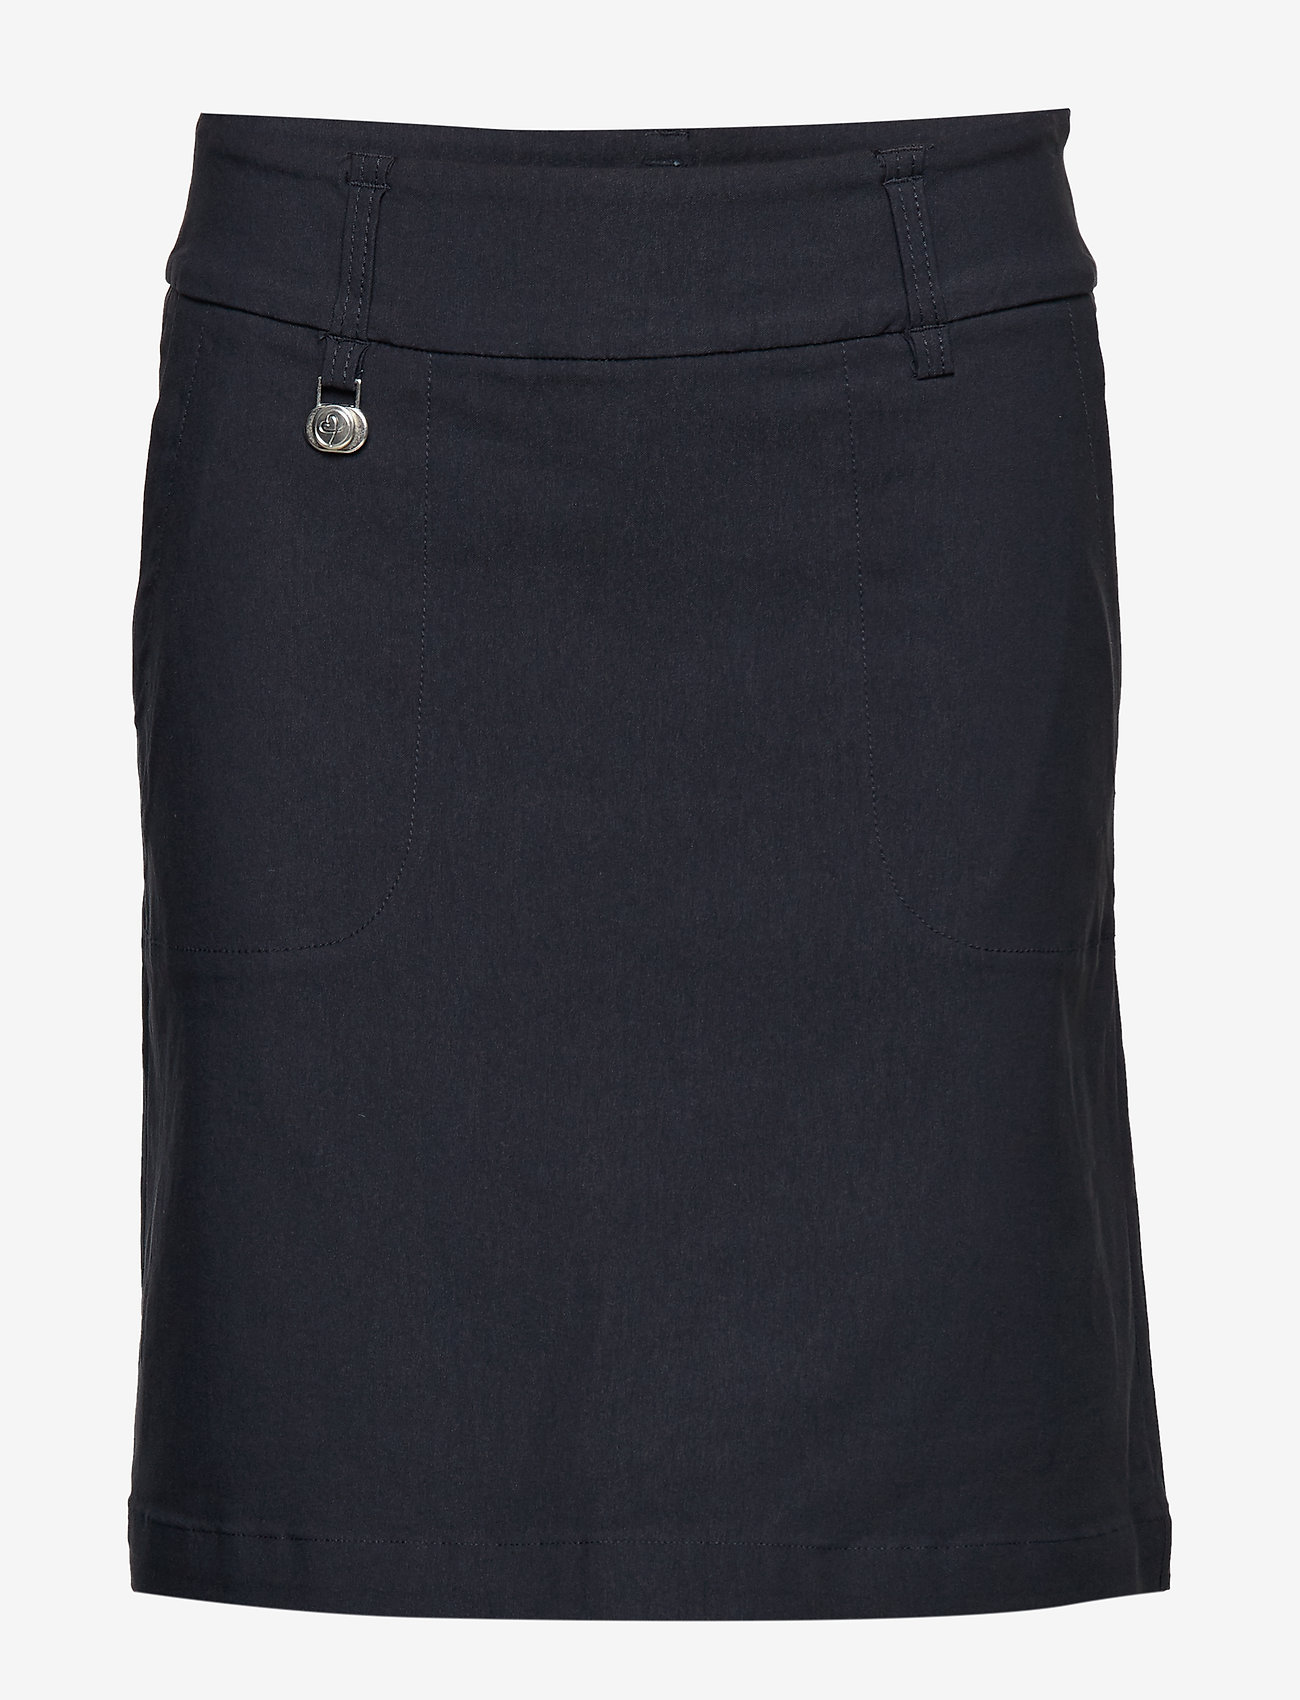 Daily Sports - MAGIC SKORT 52 CM - sports skirts - navy - 0